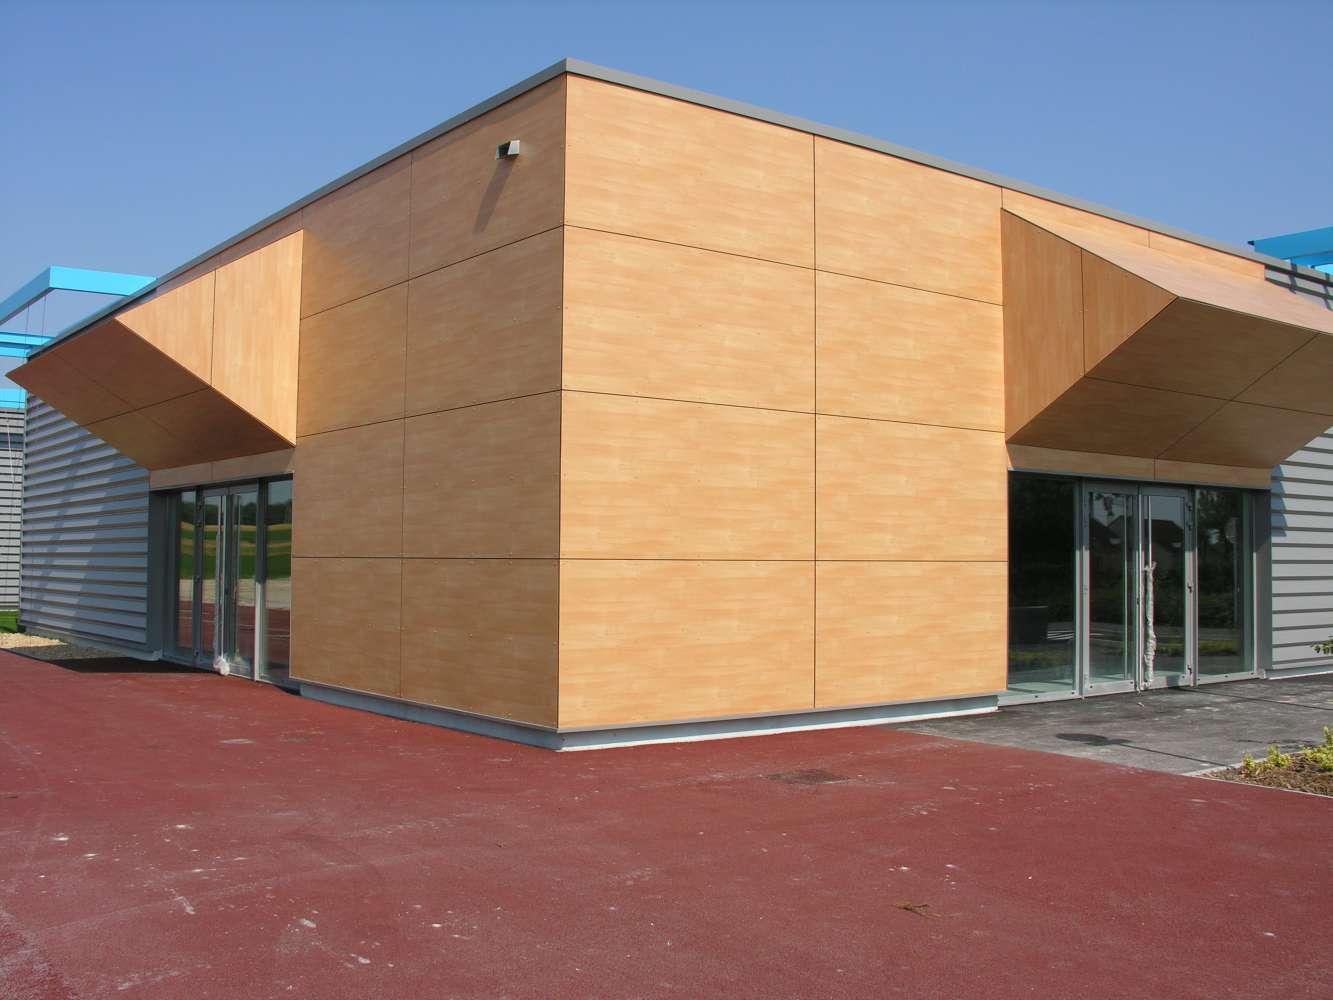 Activités/entrepôt Reims, 51100 - LES ILÔTS - 488638